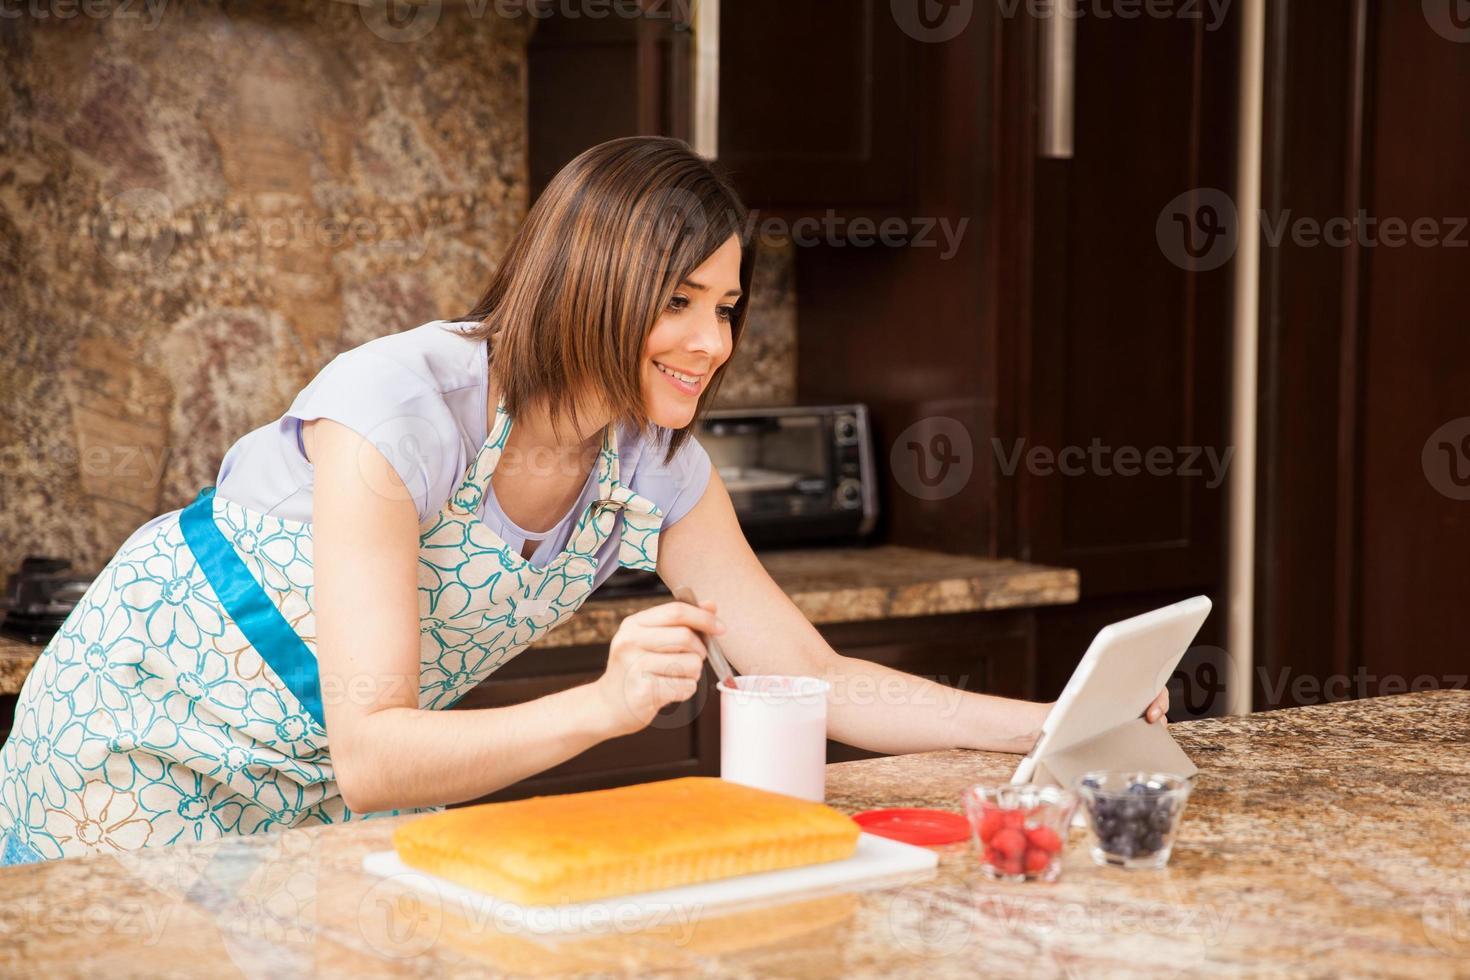 leggendo una ricetta per torte online foto